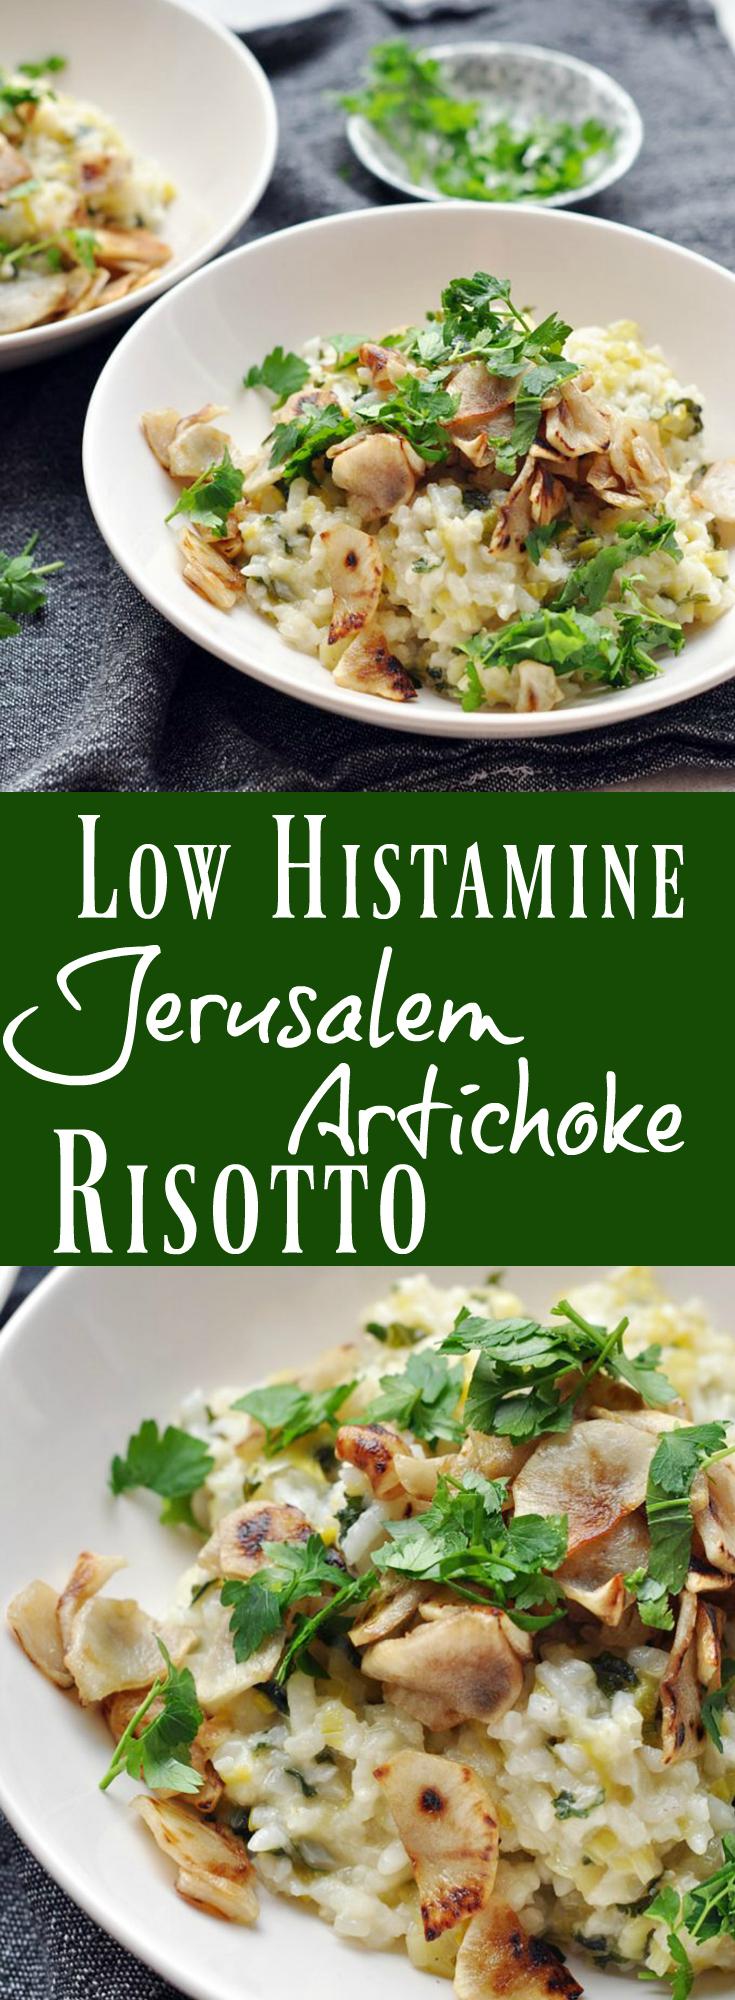 Low Histamine Jerusalem Artichoke Risotto. Pin it!